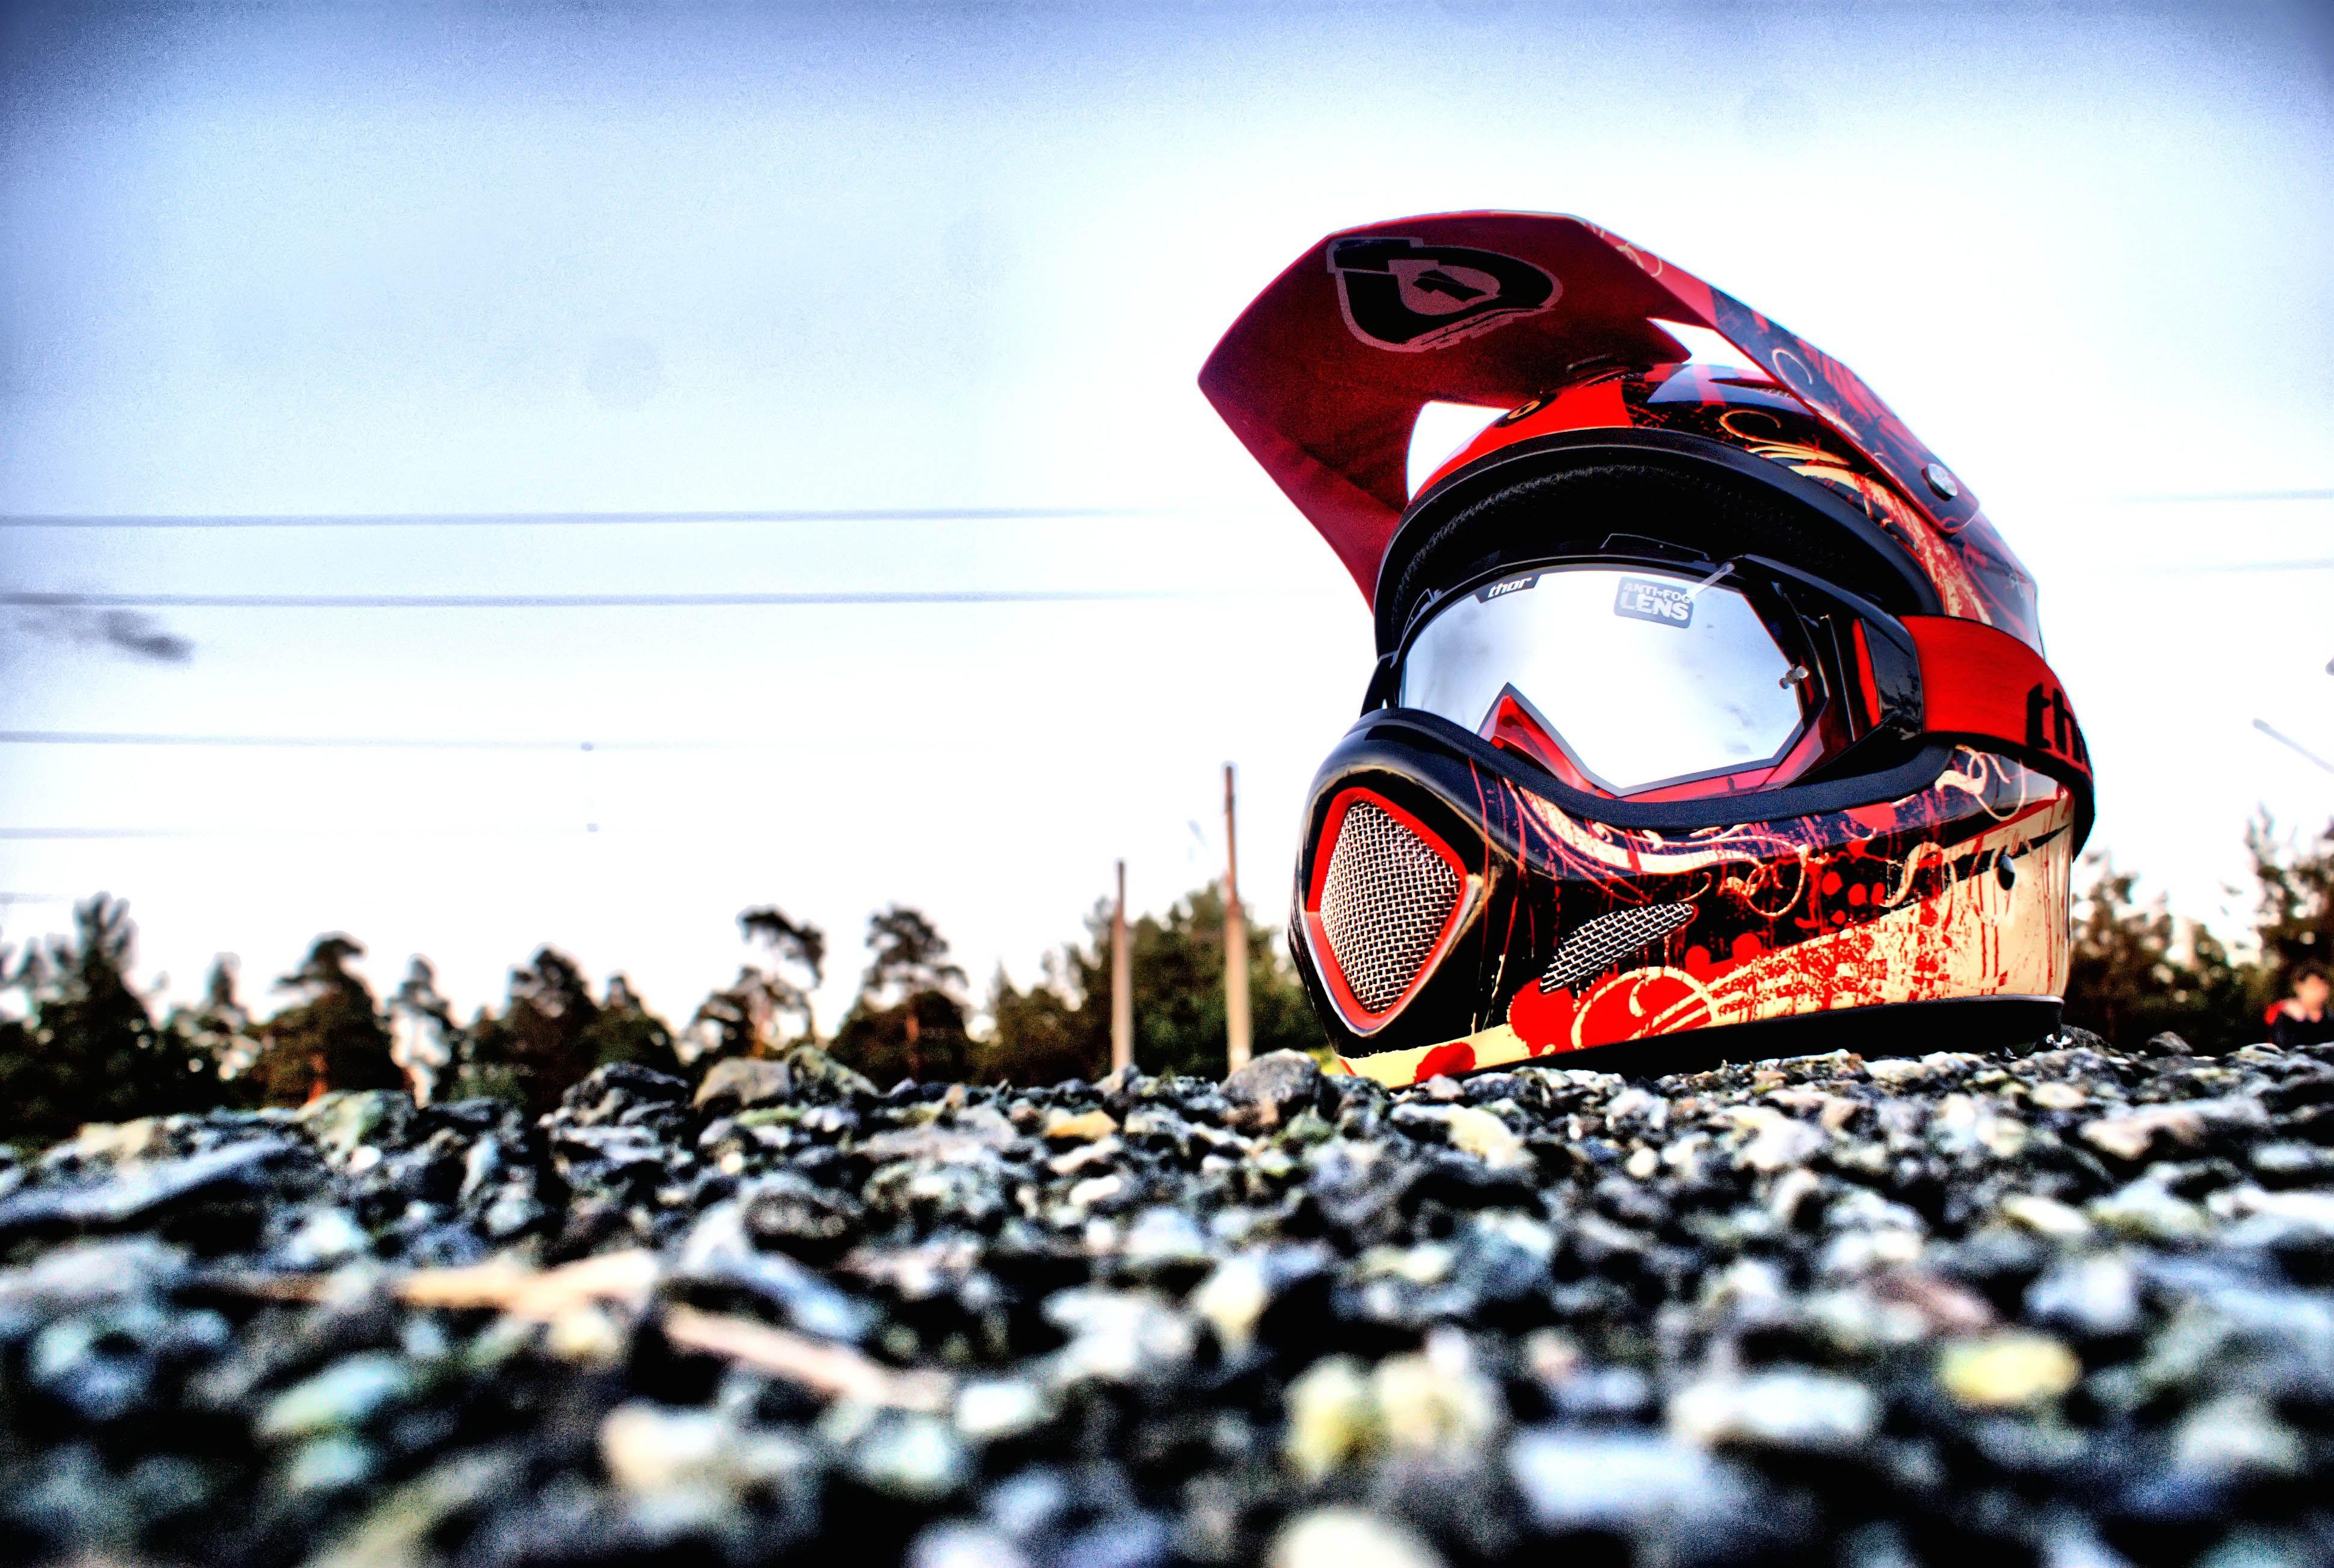 Red Mountain Bike Helmet - Wallpaper ...